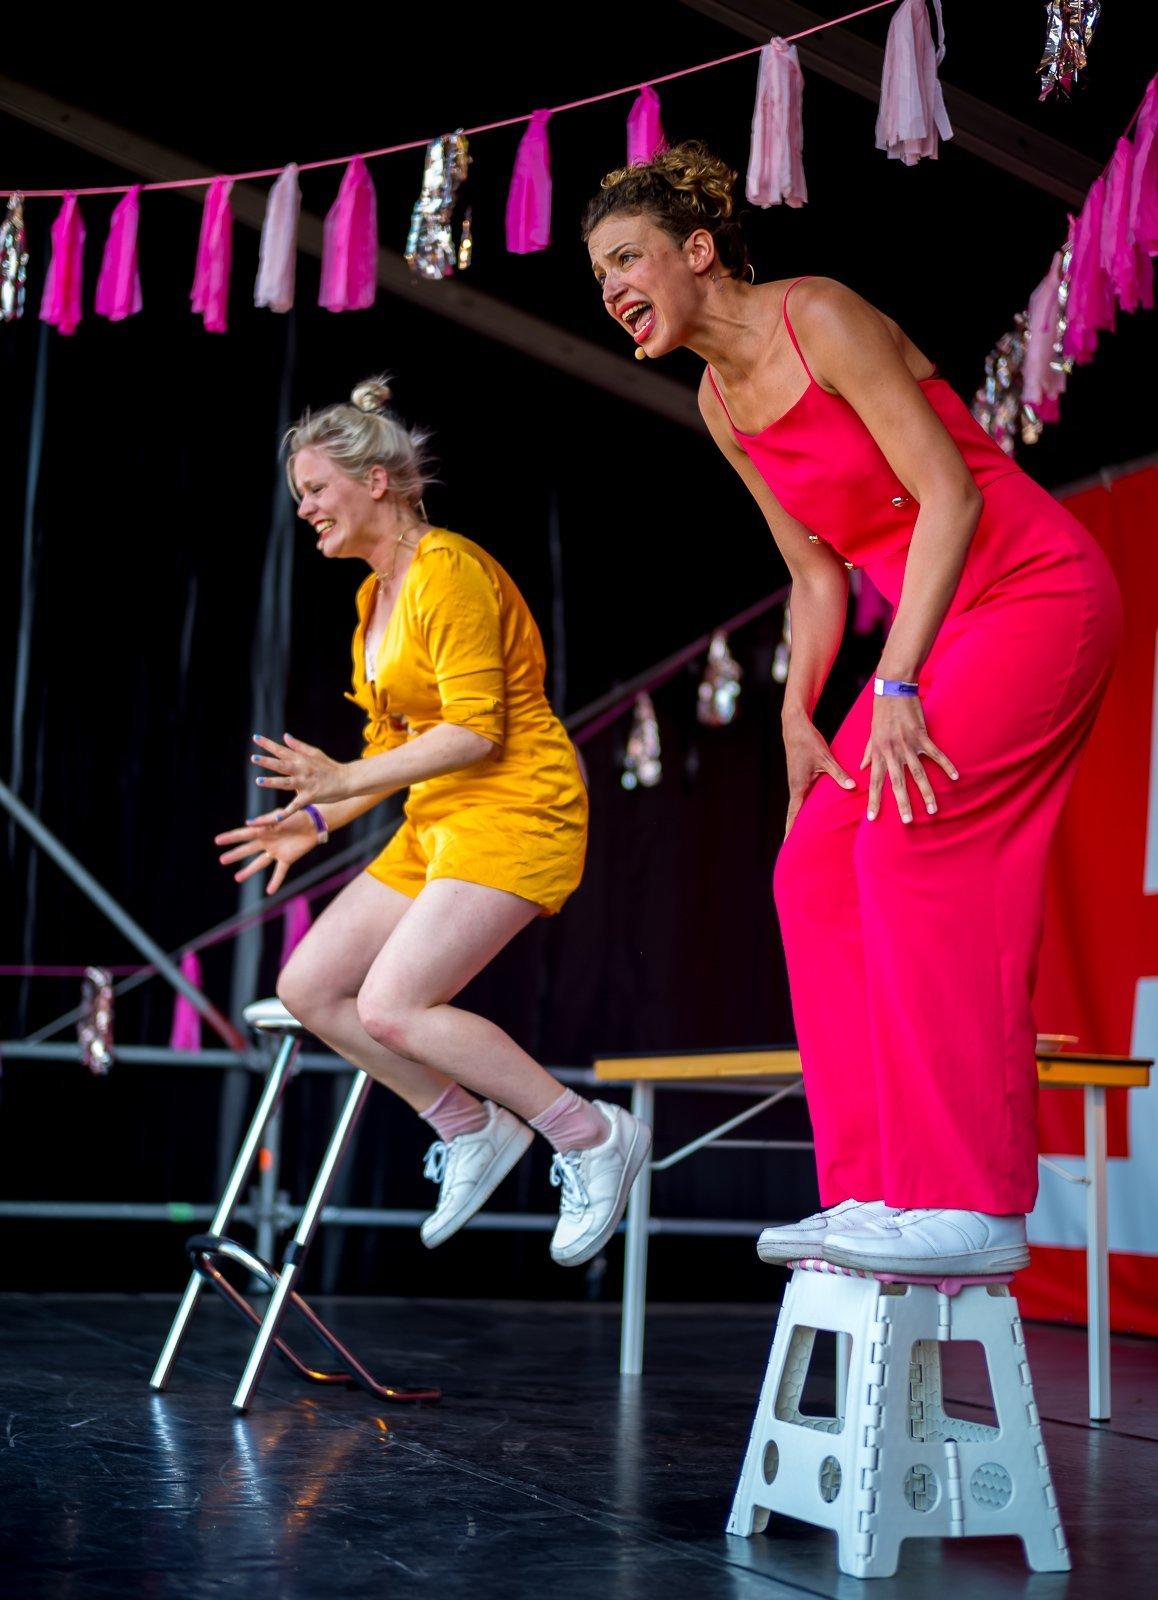 Cabaretpoel- Aanstormend Cabarettalent ( Uitgesteld tot nader order) 1